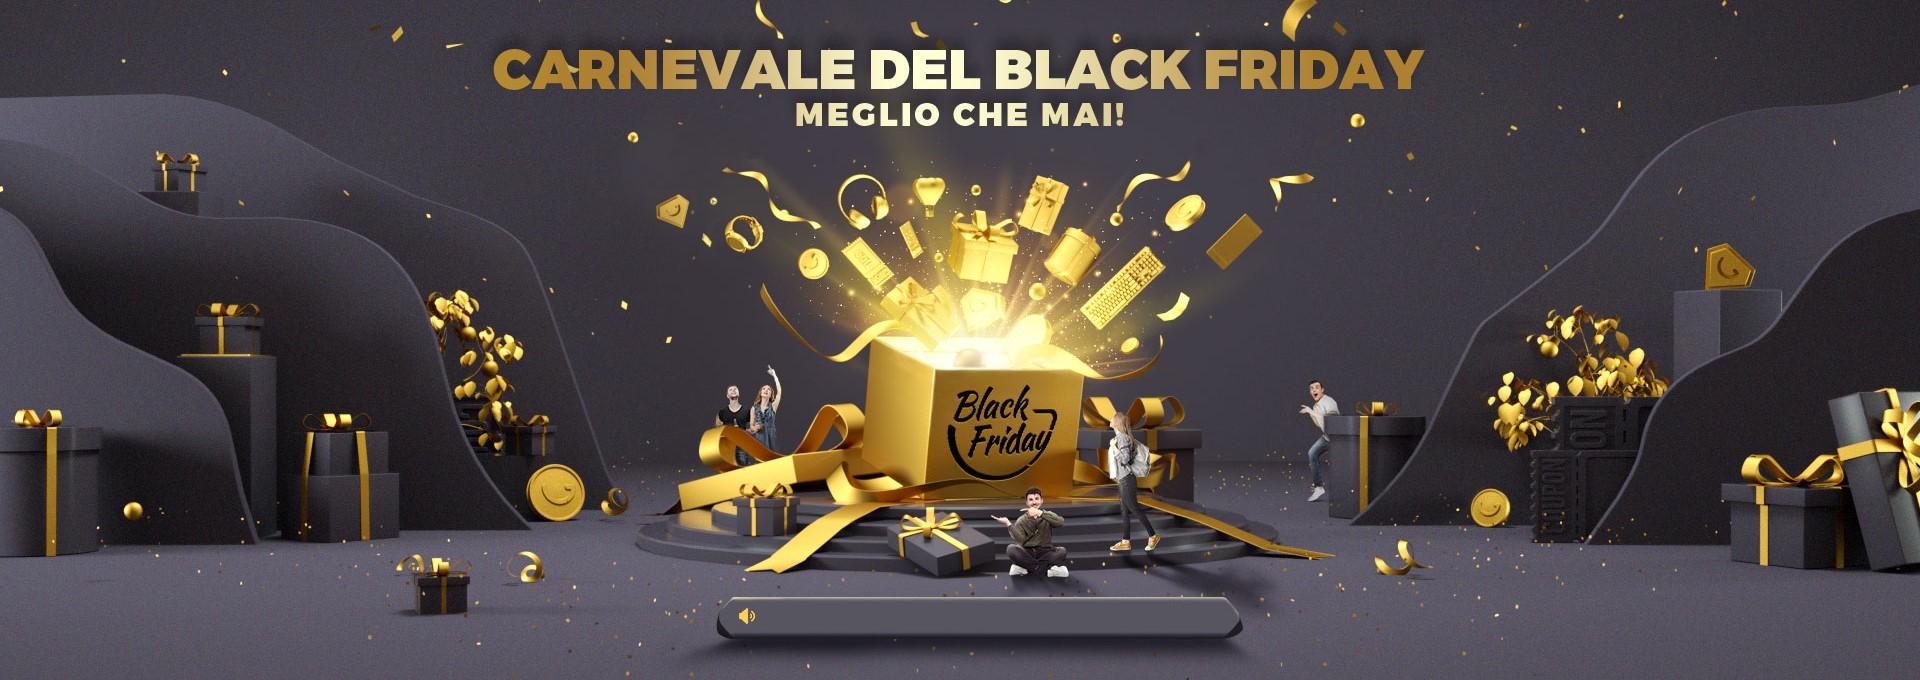 Offerte Black Friday GearBest 2019